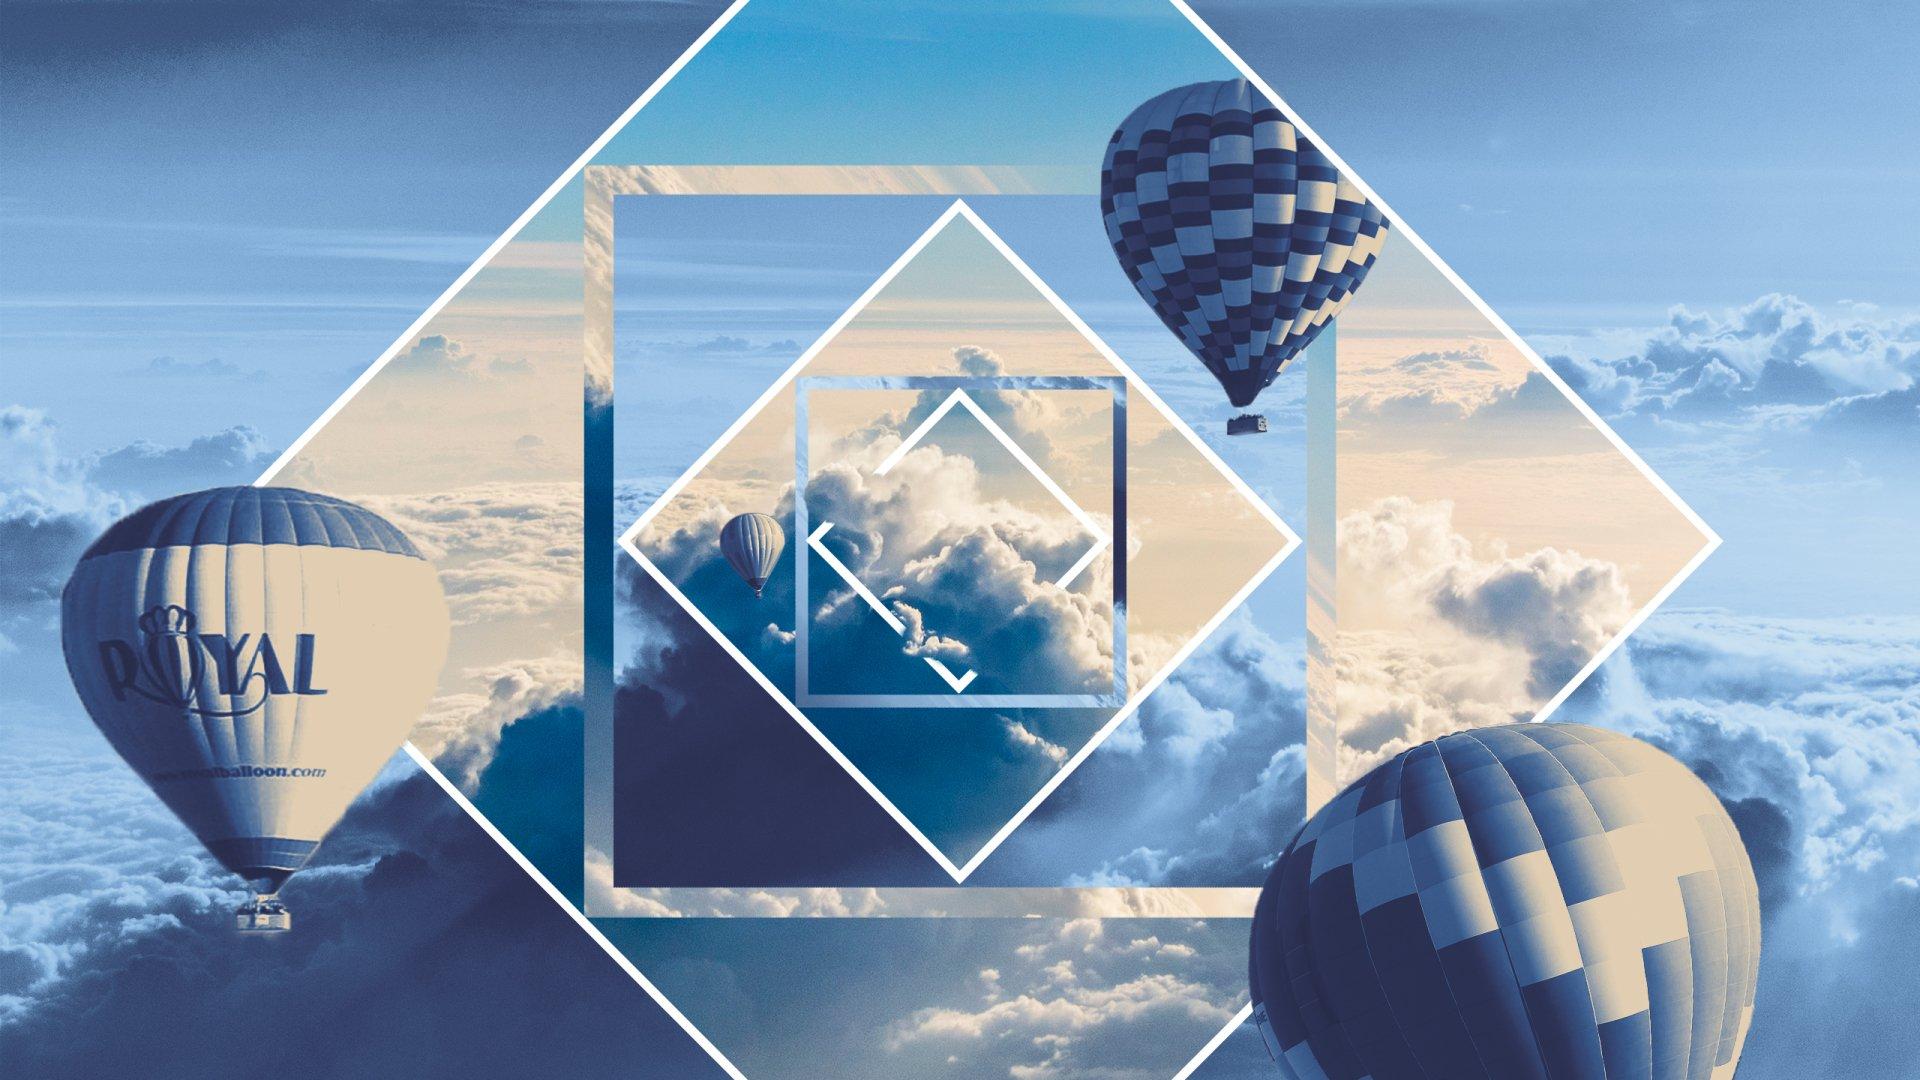 Artistic - Balloon  Hot Air Balloon Polyscape Sky Blue Cloud Wallpaper